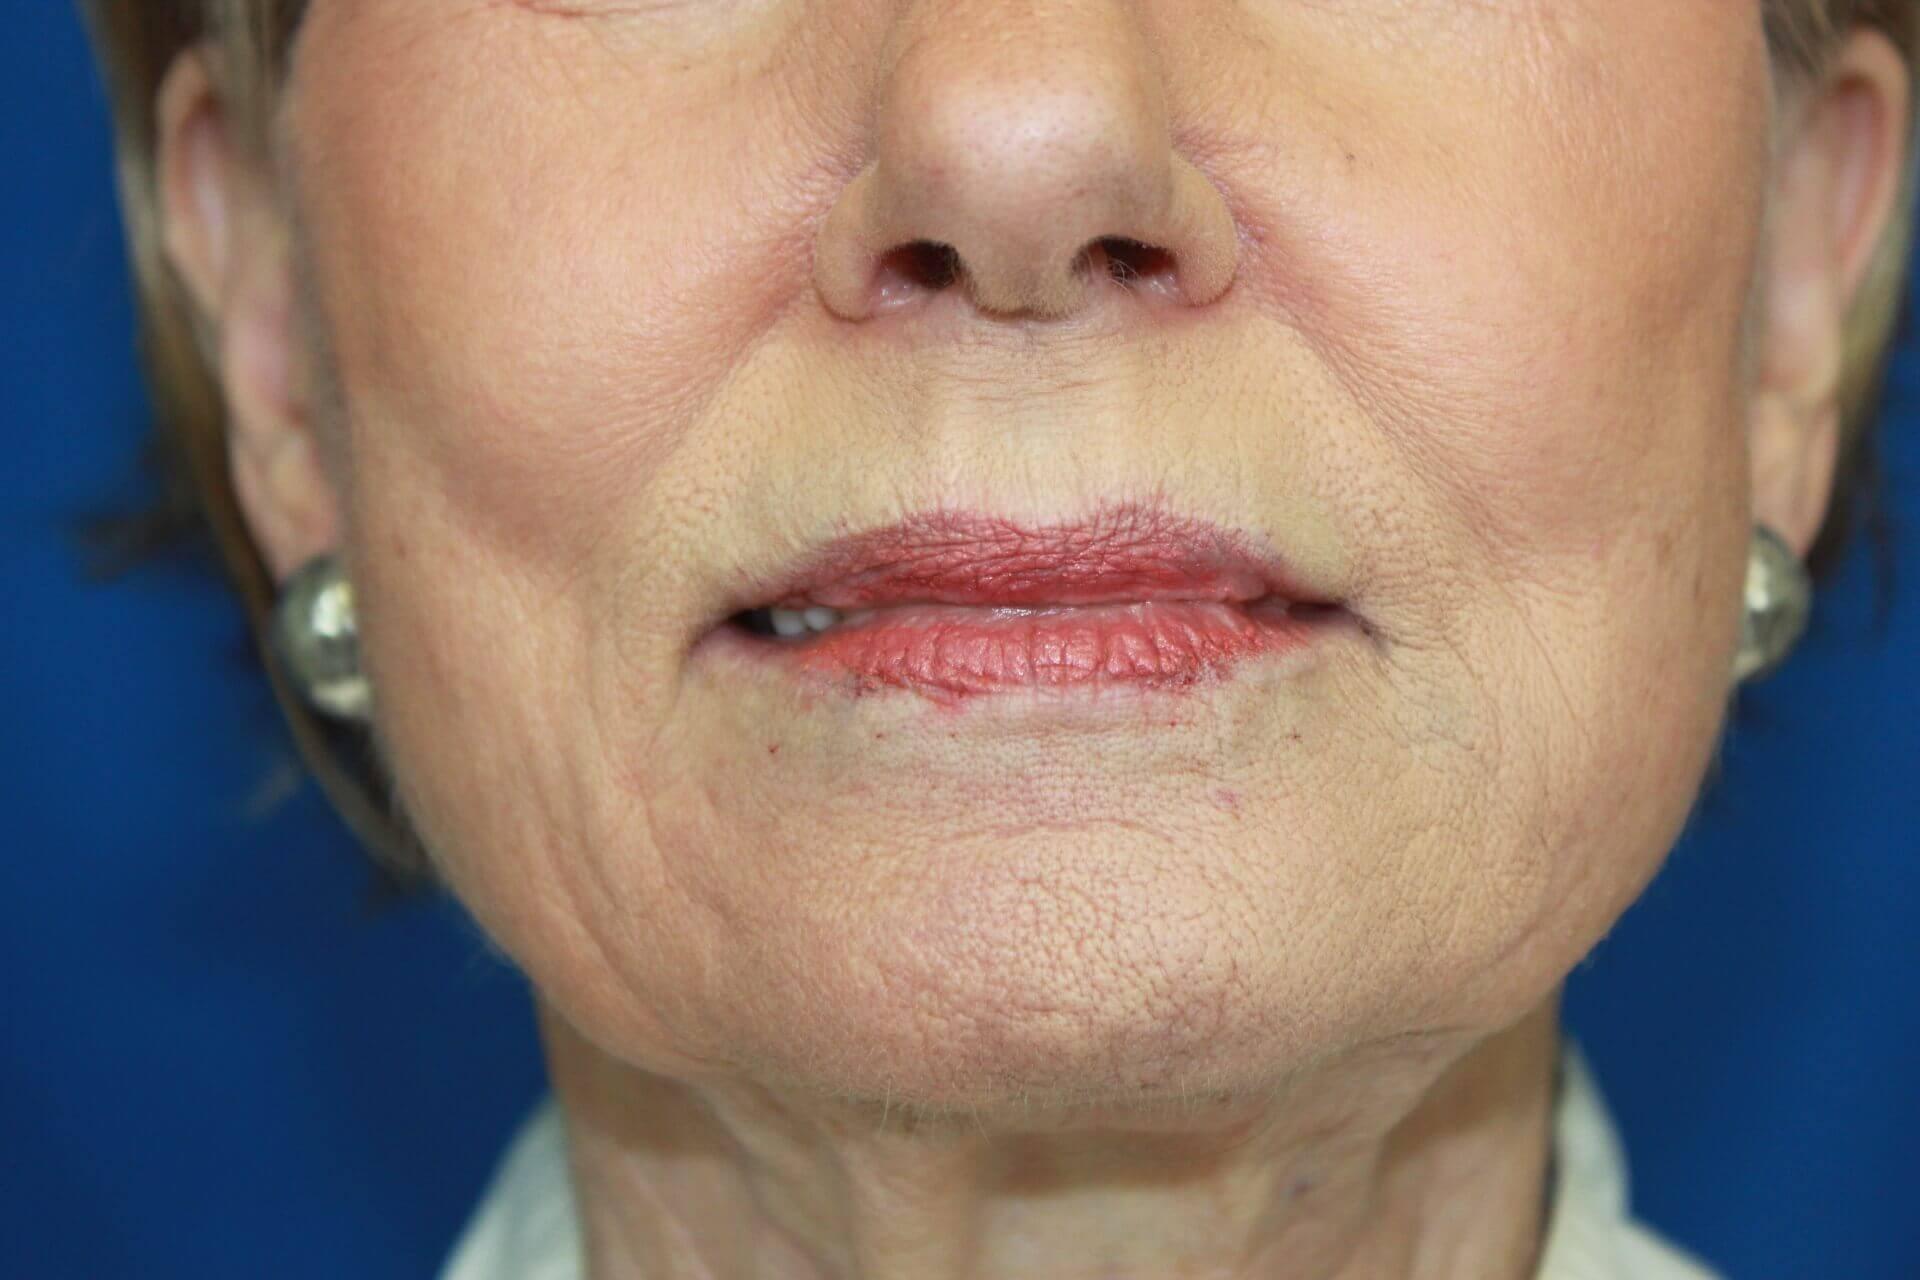 Restylane Filler for Lip Lines to Correct Lip Wrinkles, Las